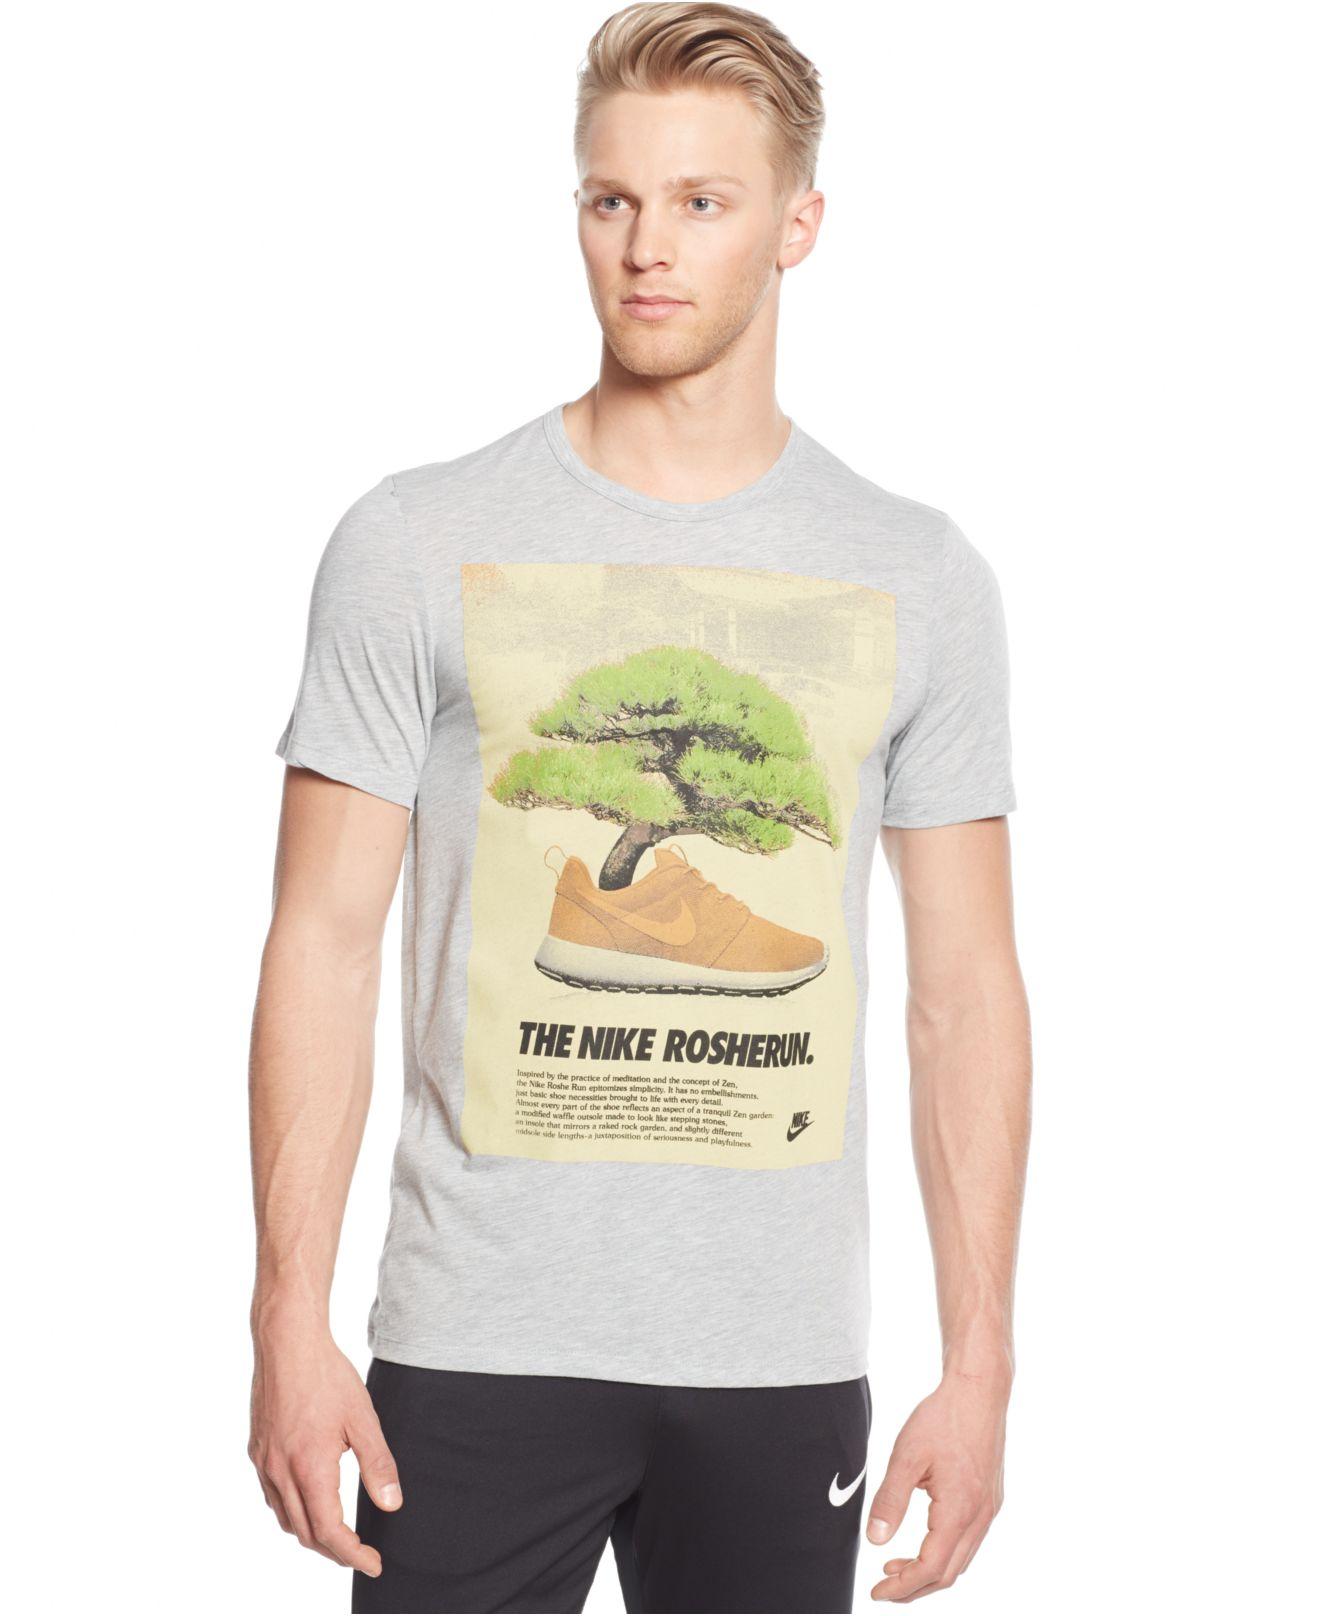 For Gray Lyst Roshe Nike Bonsai Men In T Shirt wqY6zqxp